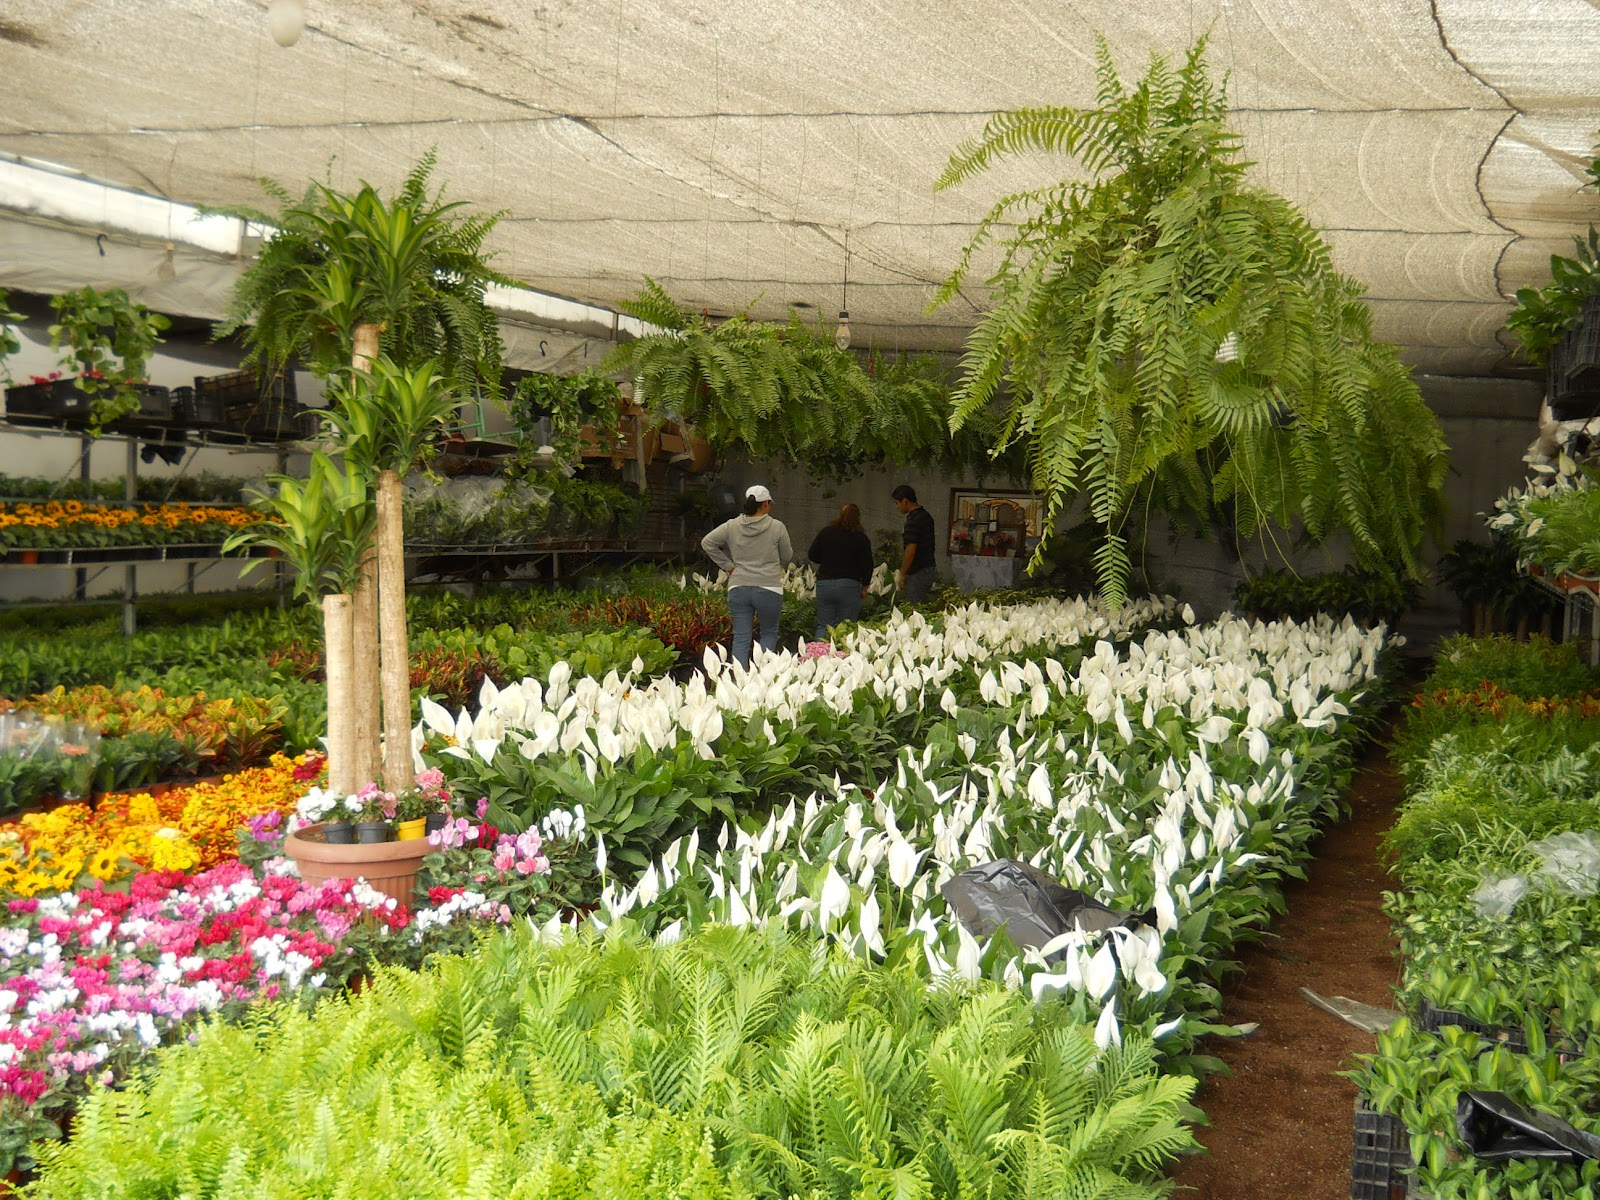 http://4.bp.blogspot.com/-Hf5KkVdSkFA/T4GsNYMvUKI/AAAAAAAAA1E/L6Z2WPh6_Po/s1600/Invernadero+en+Madre+Selva.JPG